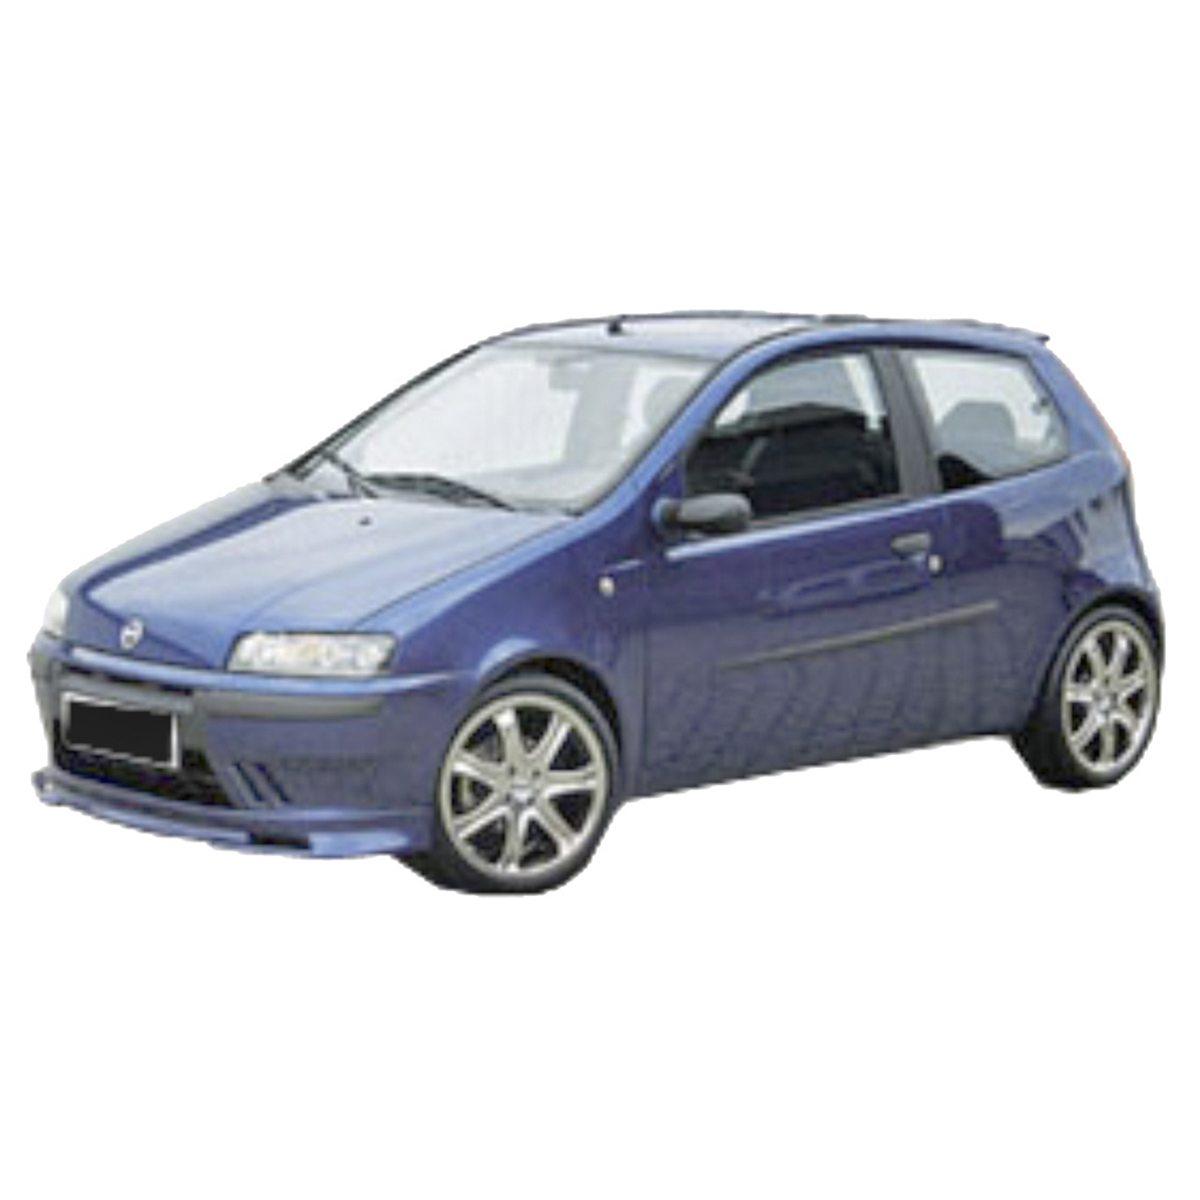 Fiat Punto (99-03) – Spoiler Frente Small